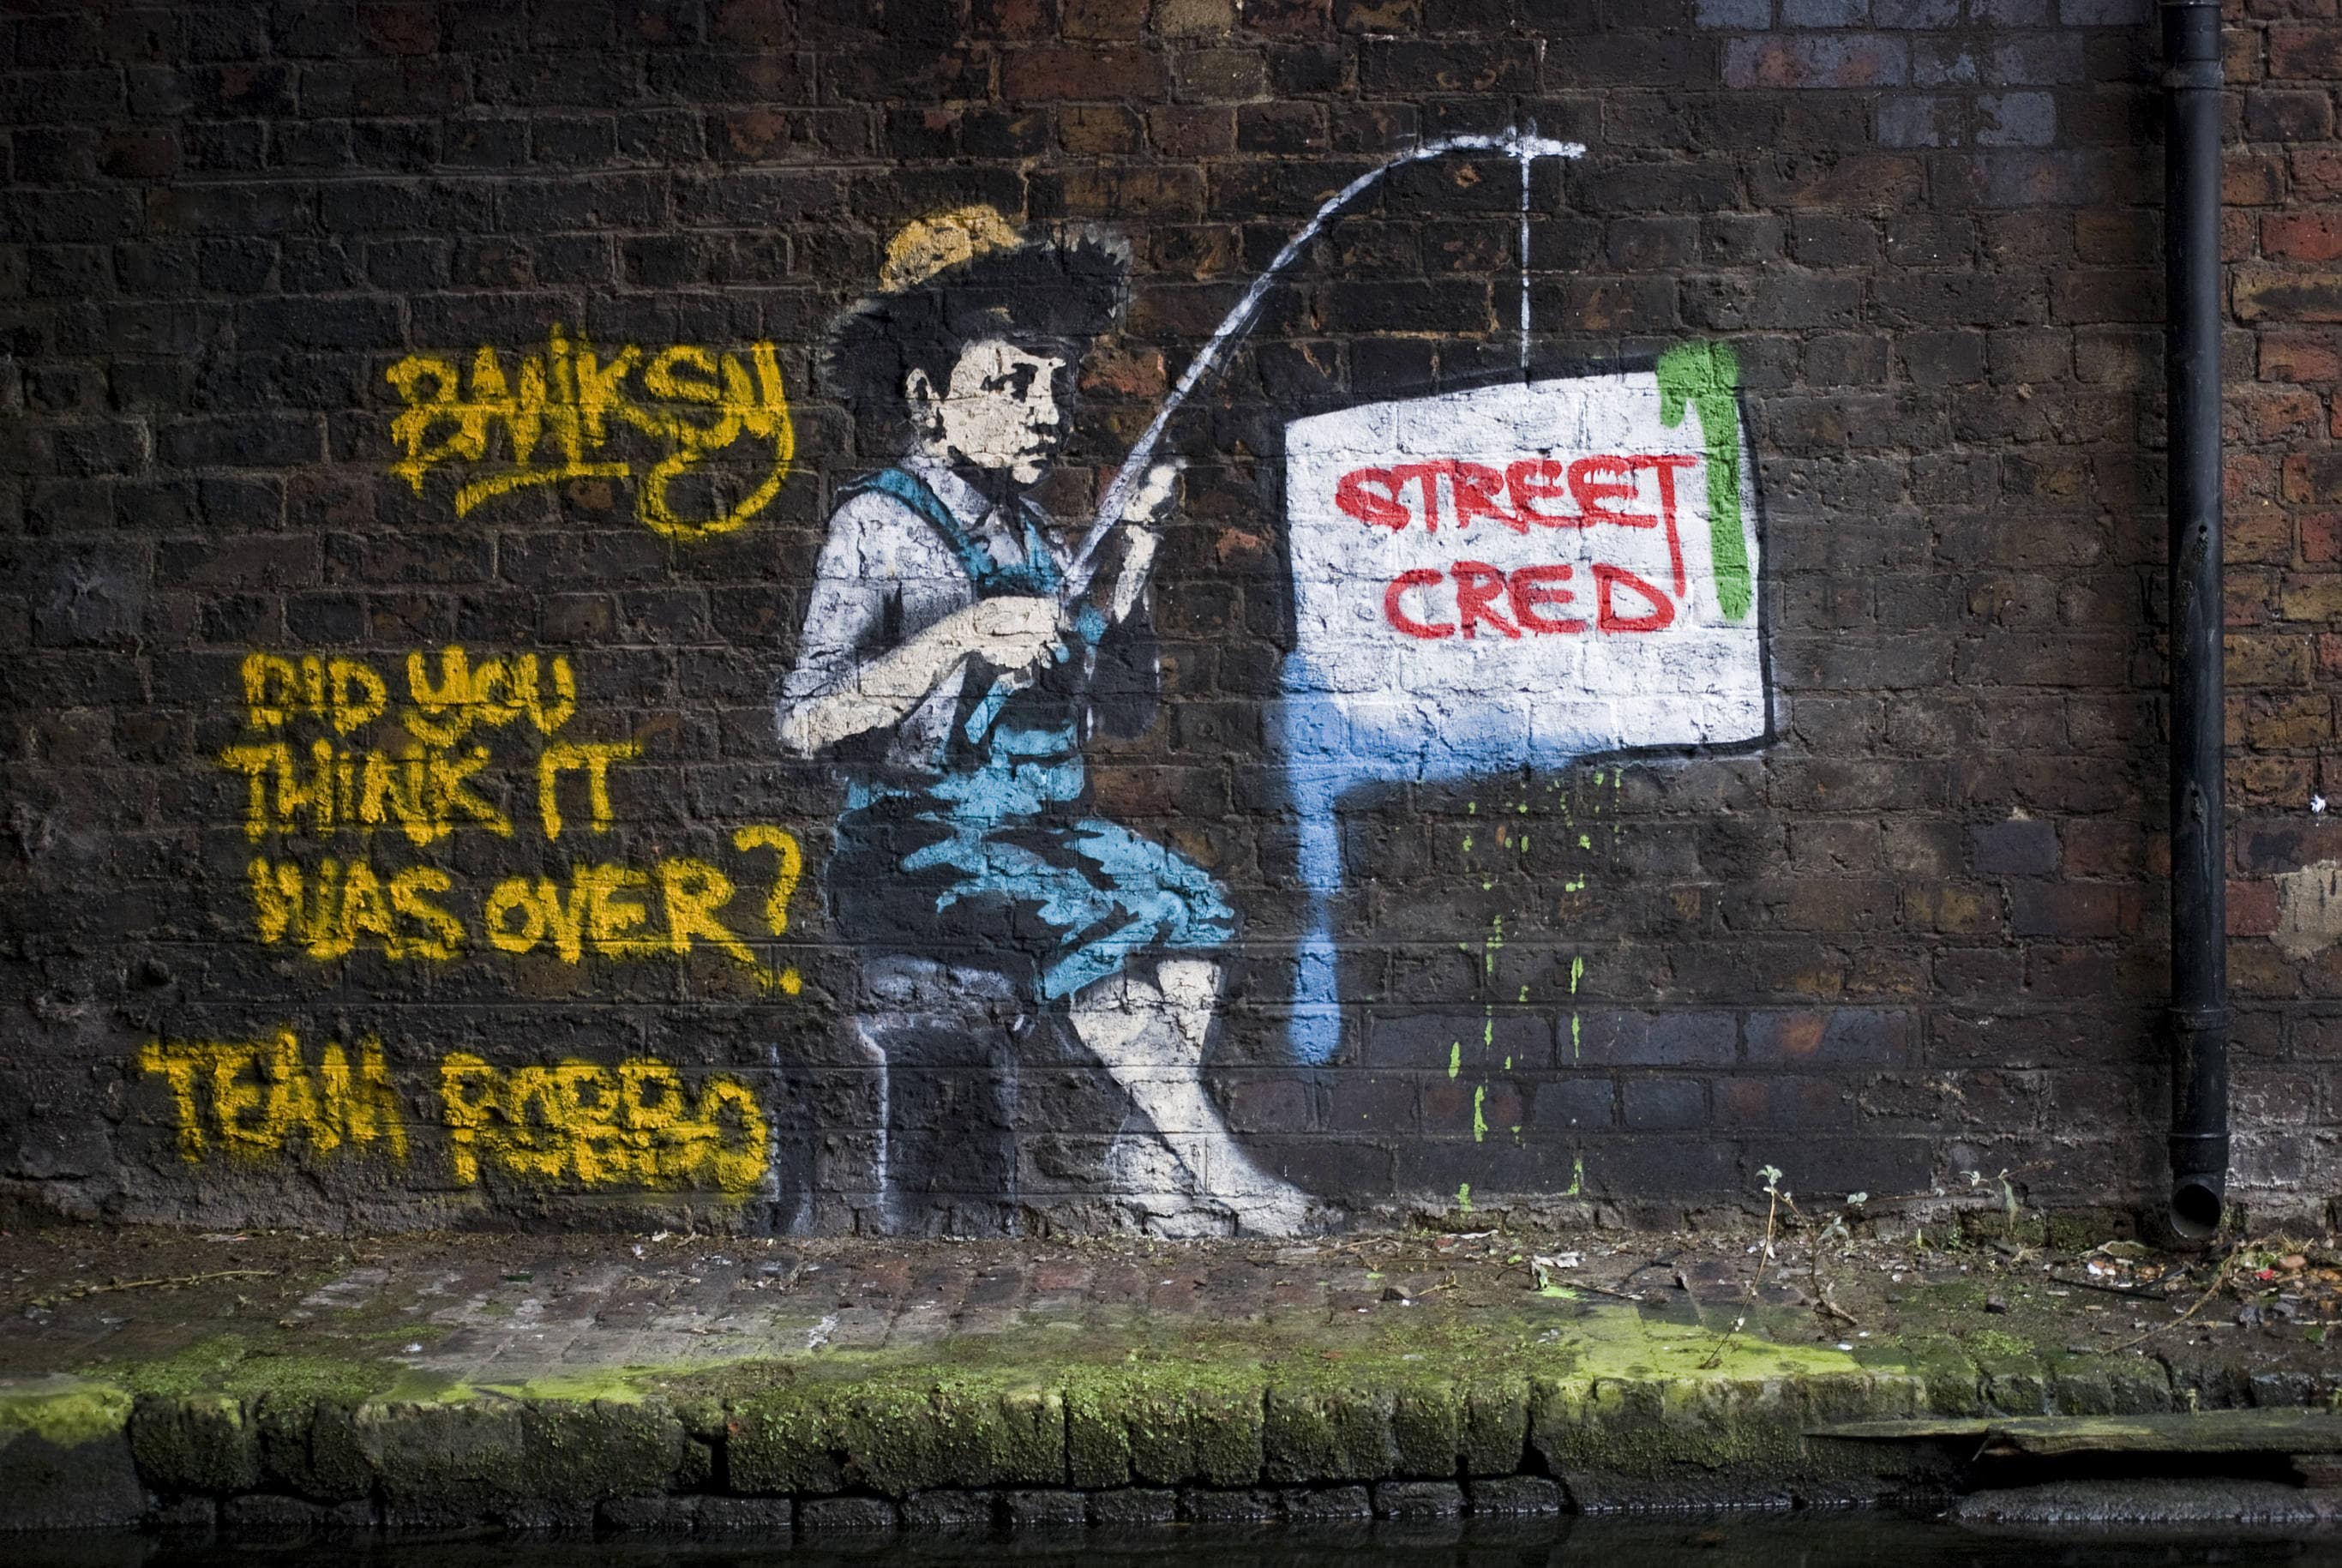 Street art graffiti canvas painting banksy robbo tags fishing camden london uk super size print stencil urban wall decor